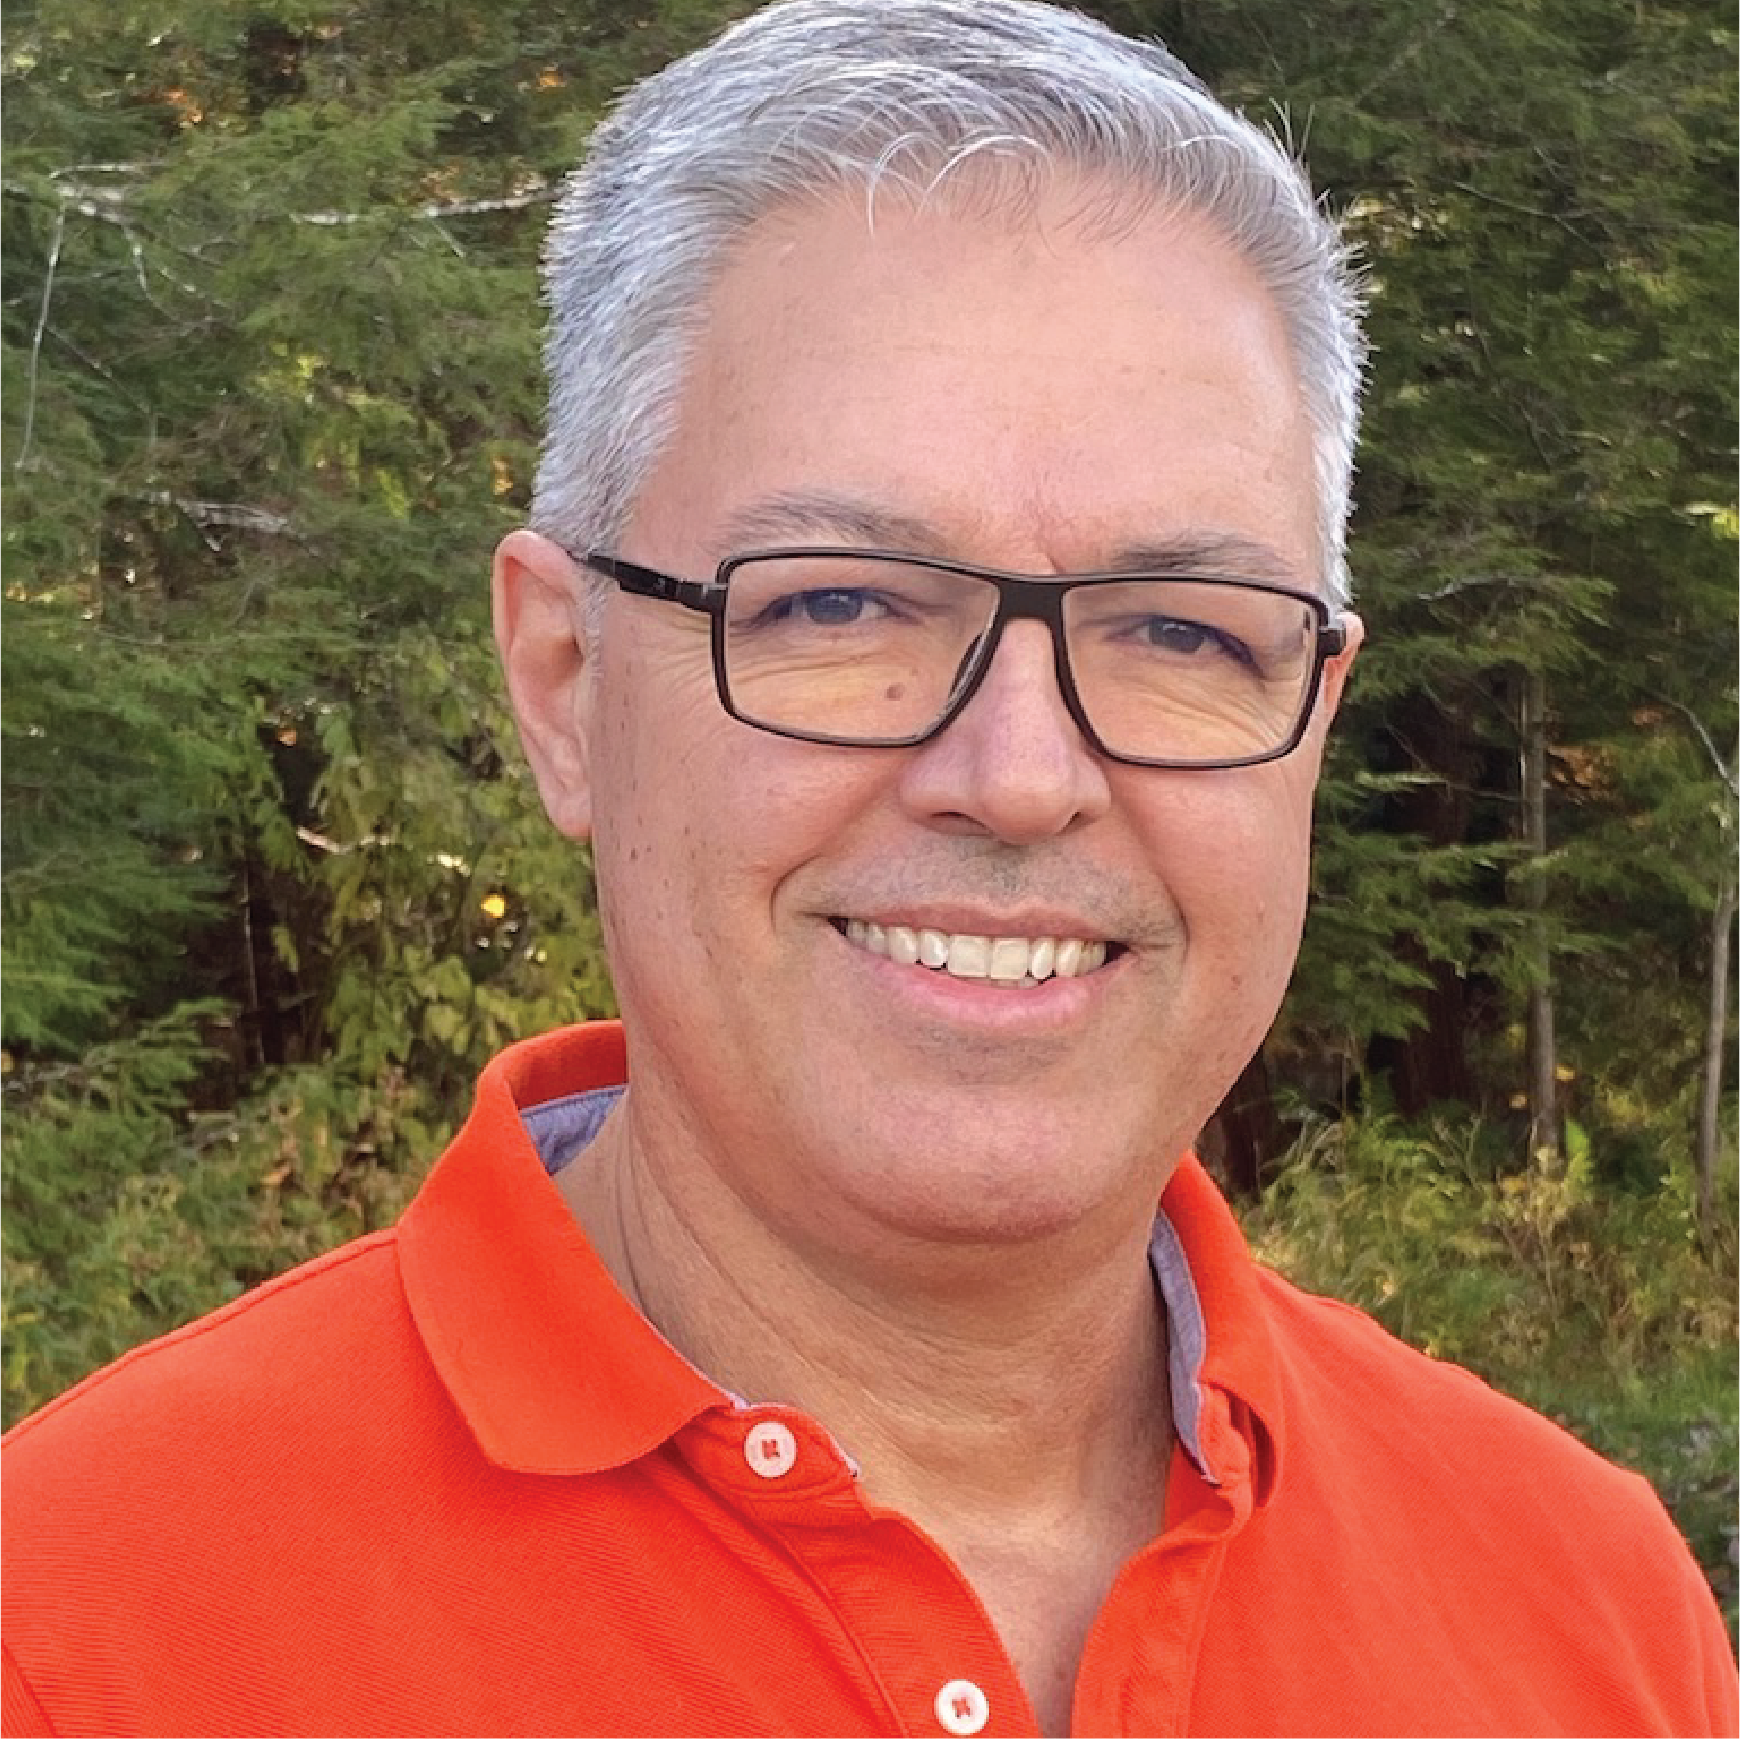 Osvaldo Correia